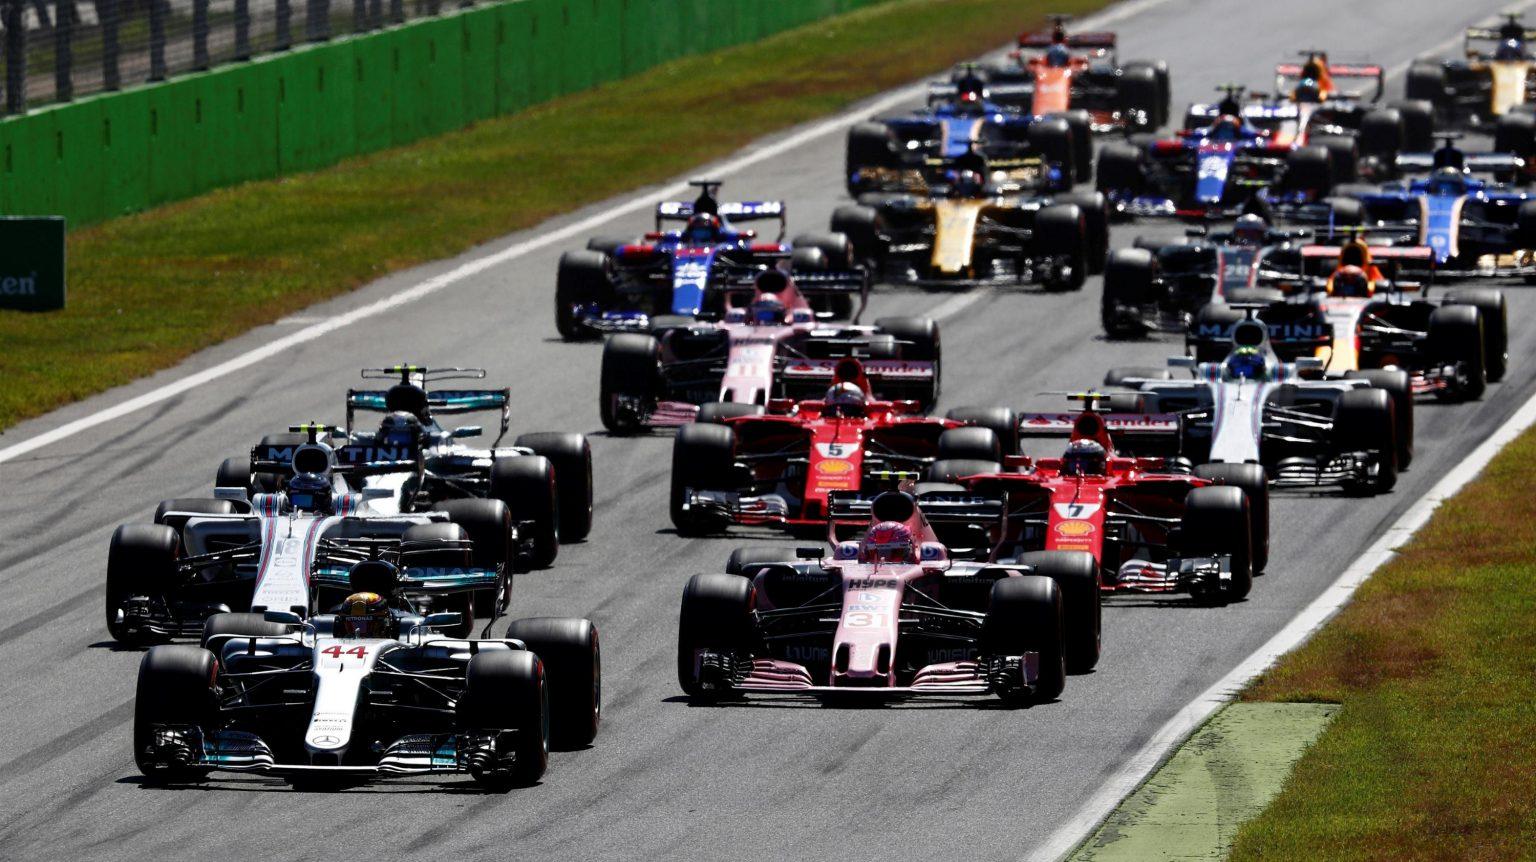 Photo of F1 İtalya GP: Hamilton rekor kırdı, Vettel liderliği kaybetti!